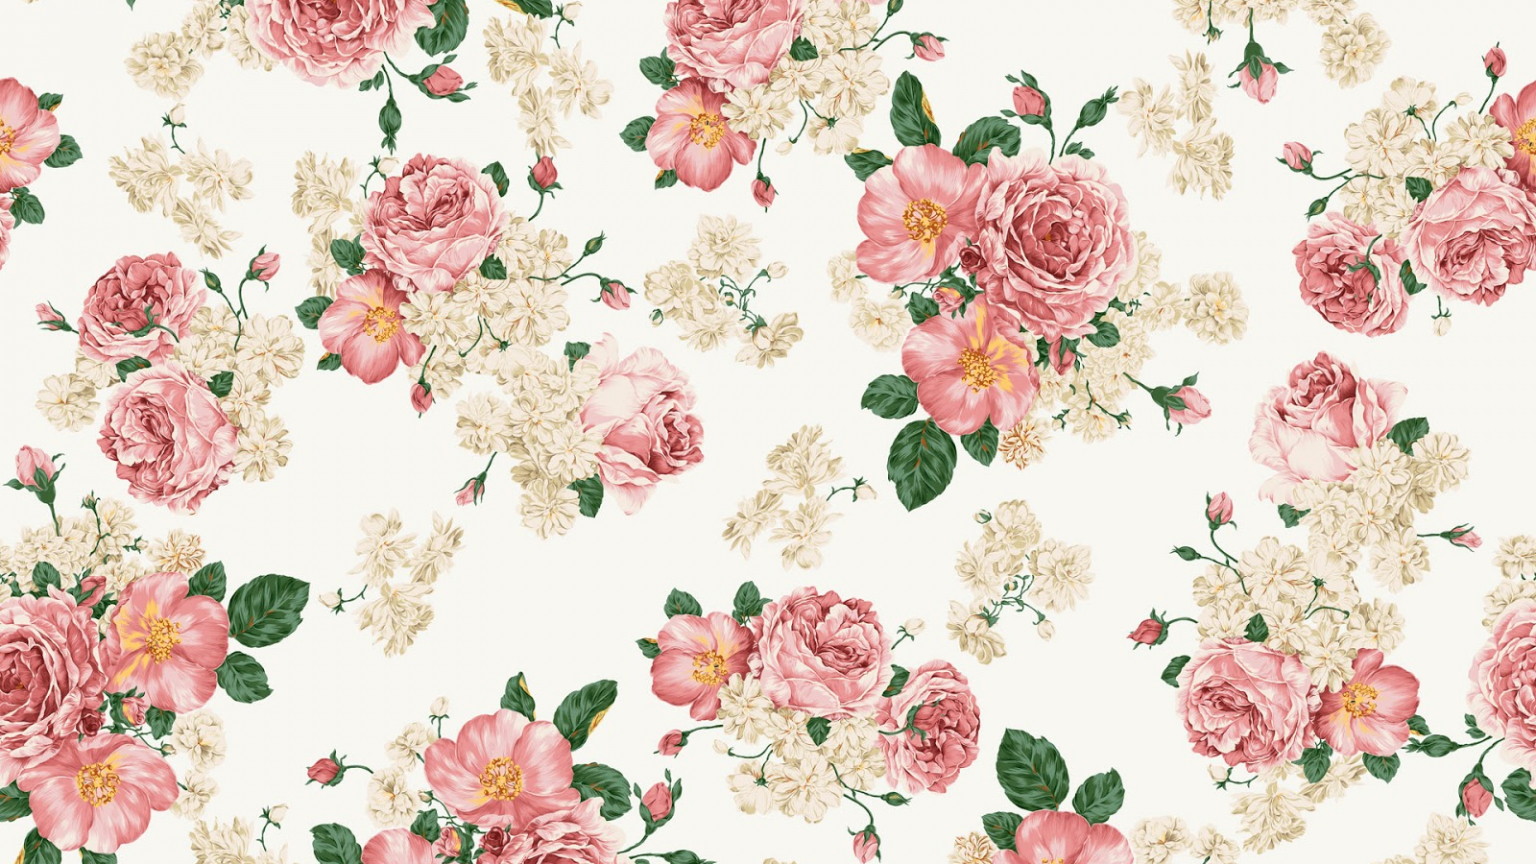 Free Download Vintage Floral Wallpaper Pattern 1600x1000 For